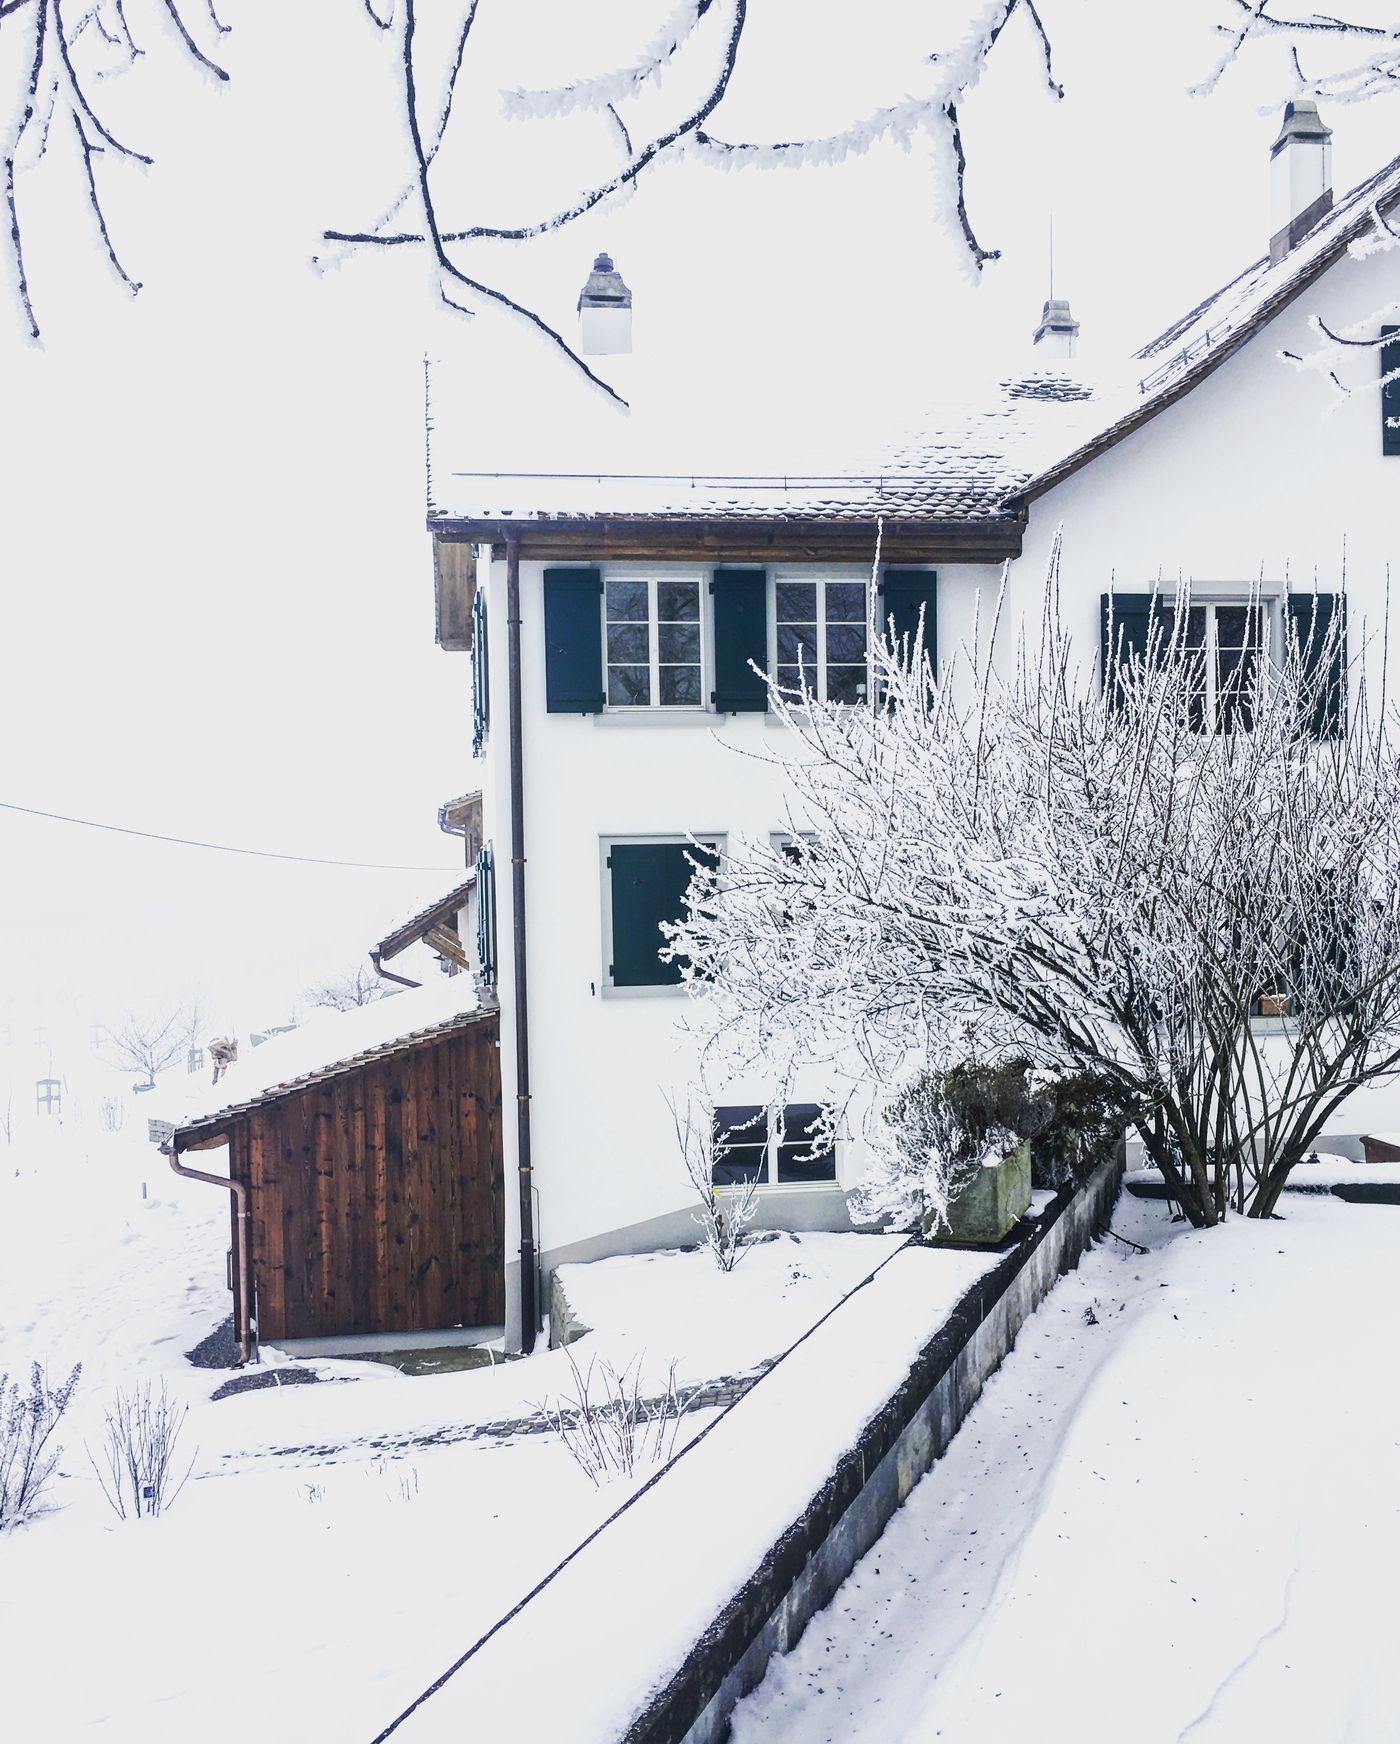 Wintergarten bilder deko ideen - Deko wintergarten ...